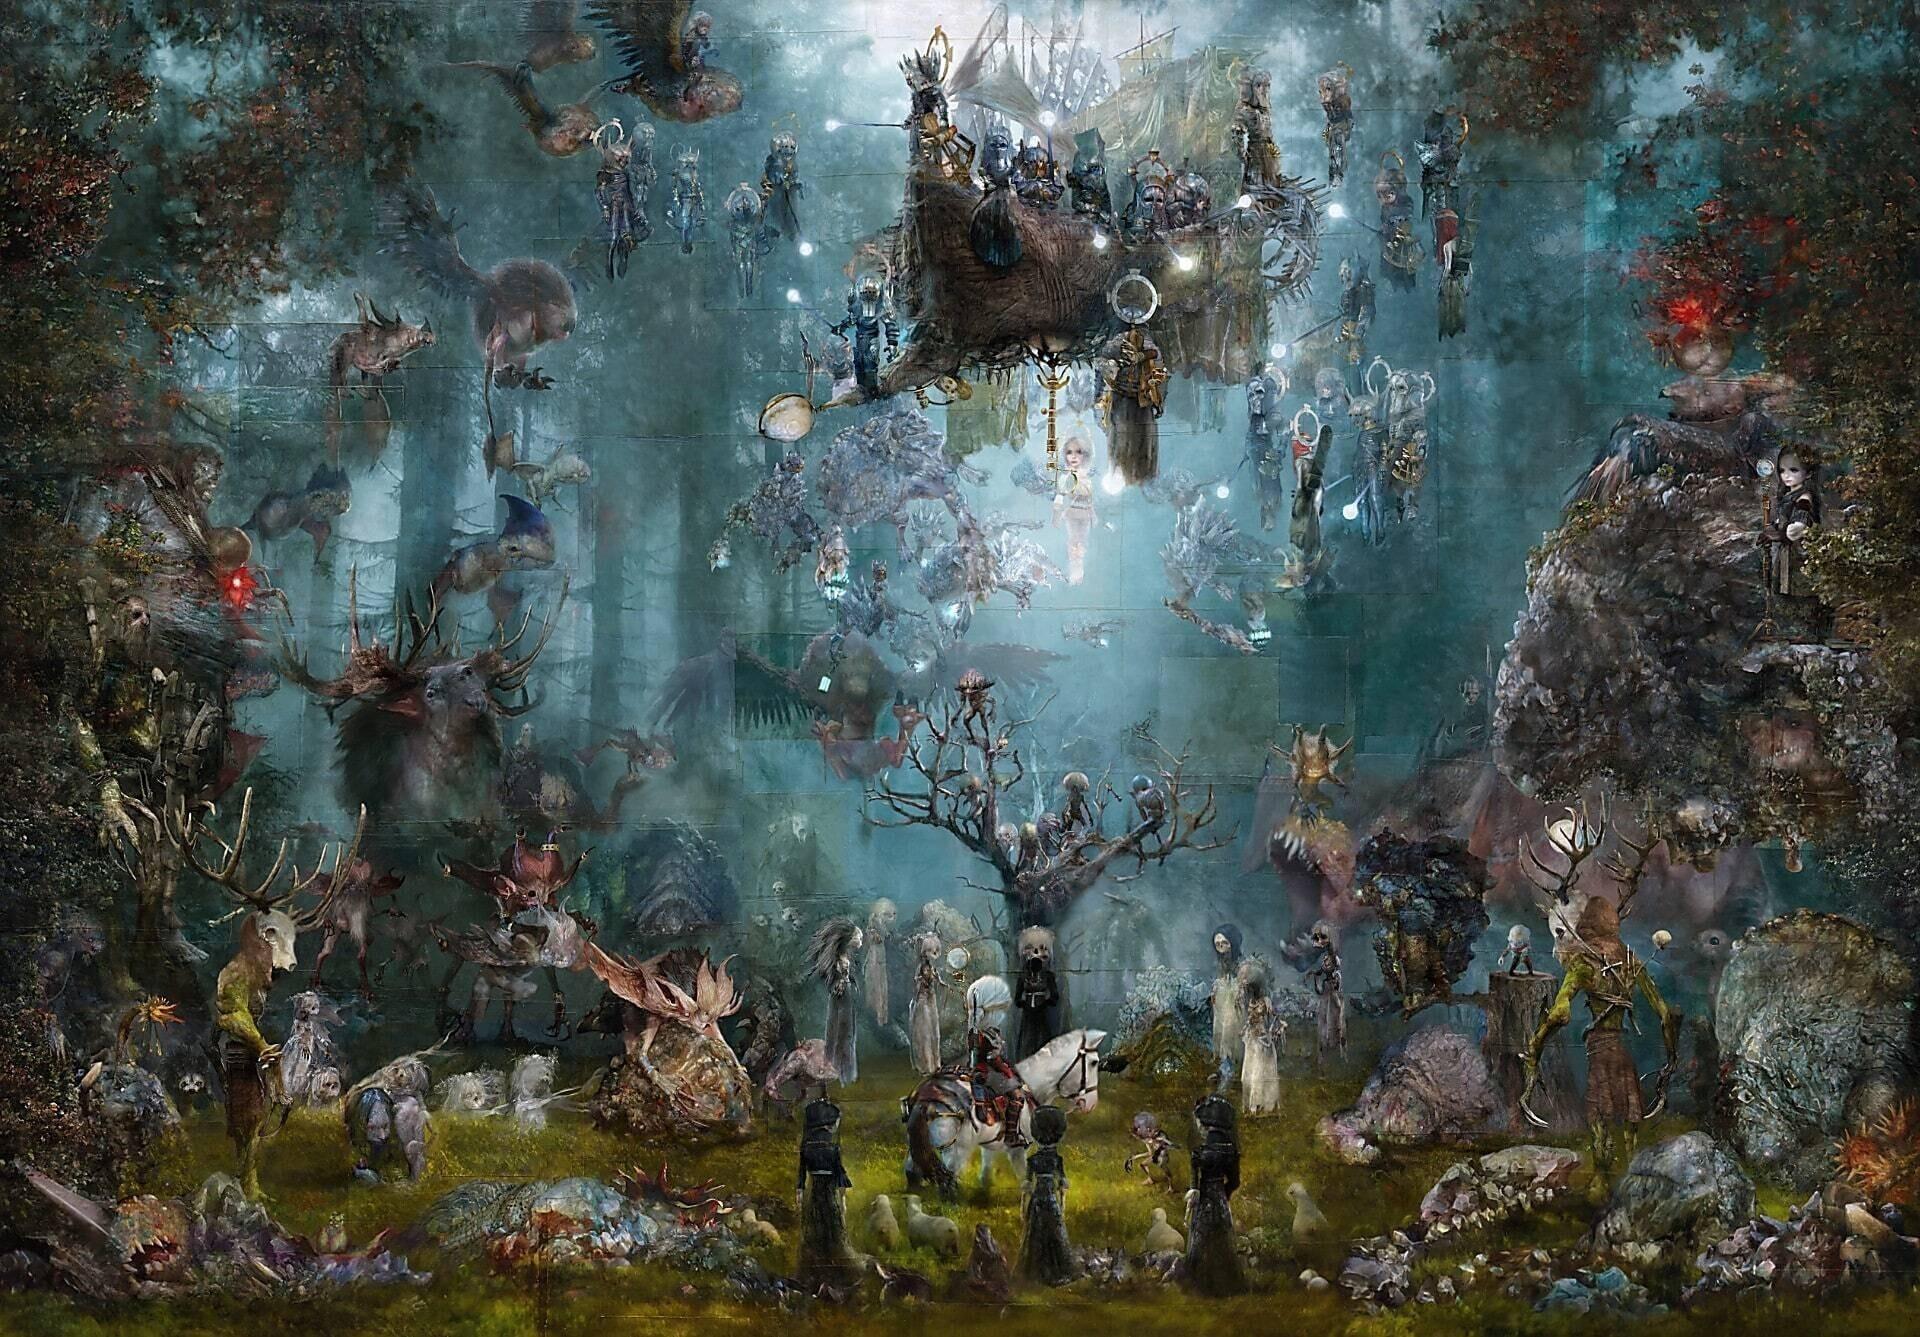 Художник нарисовал картину по мотивам The Witcher 3 ее продают за 20 тысяч долларов